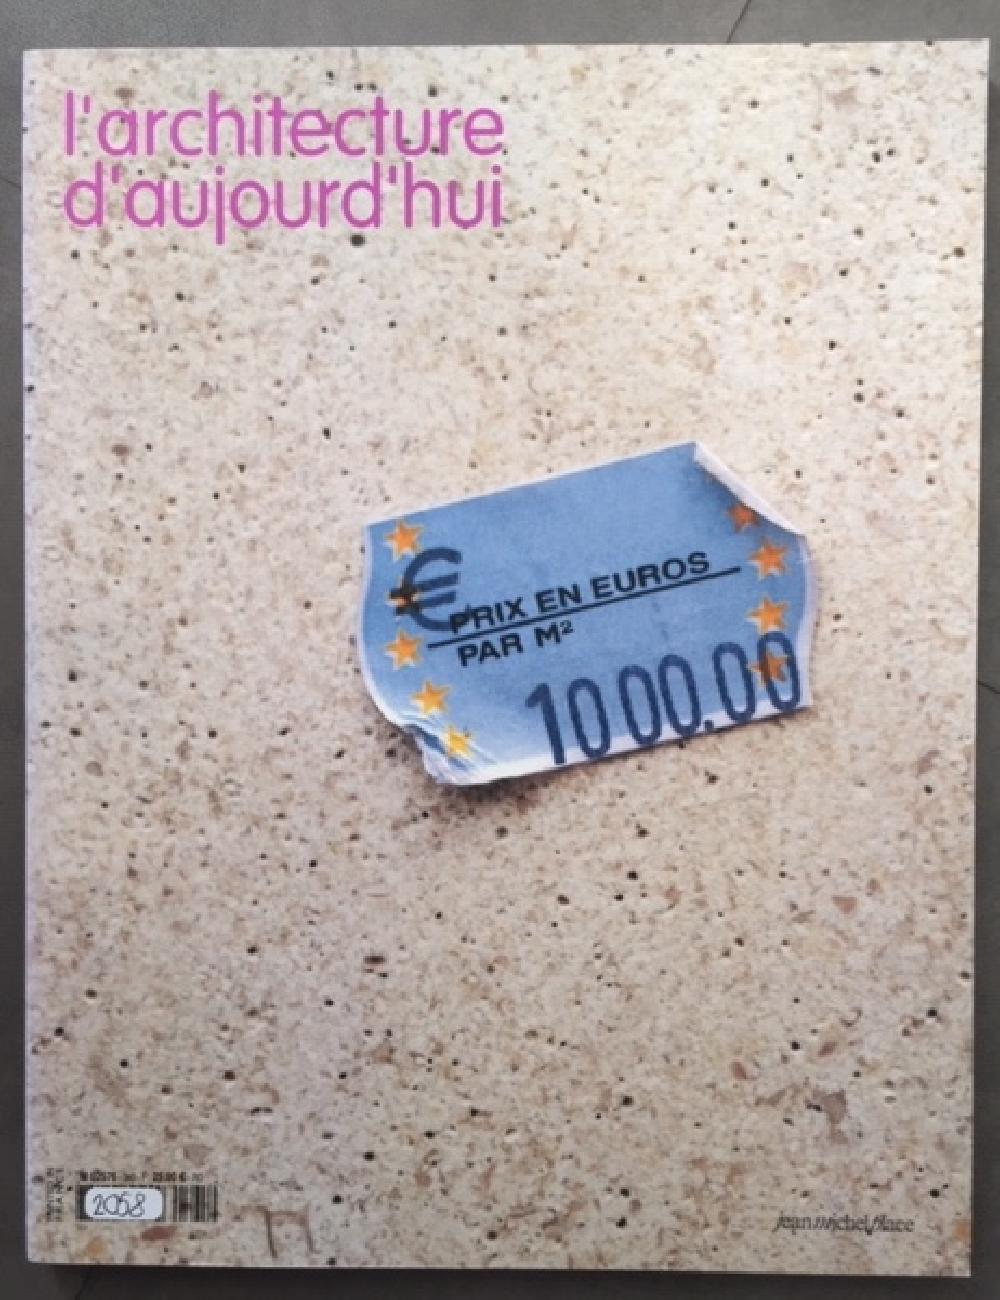 N°345 - 1000 euros par m2